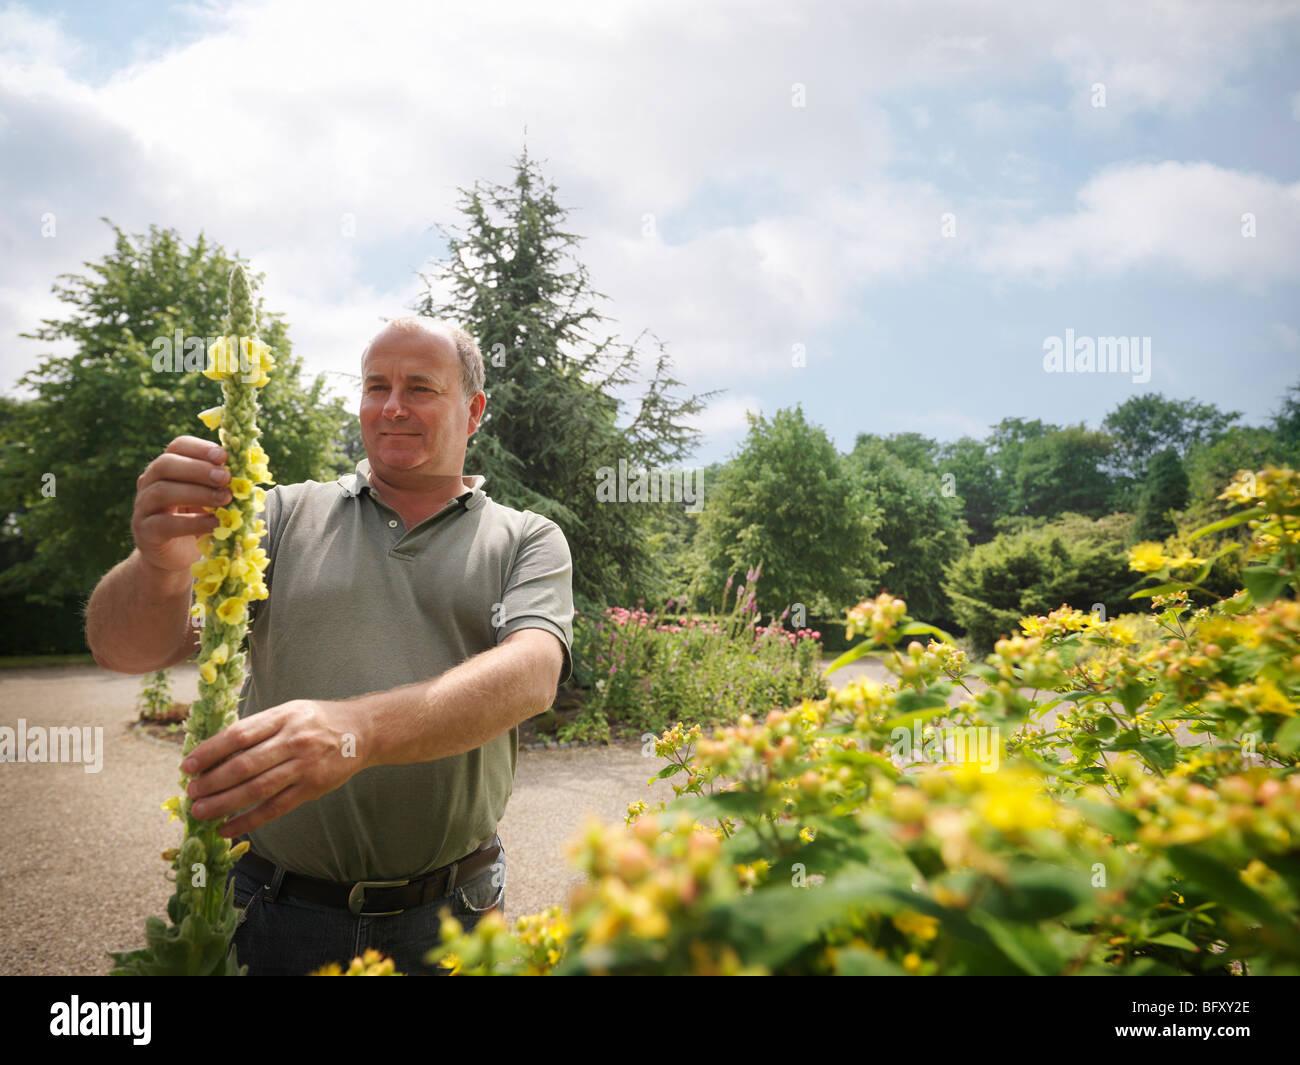 Gardener Inspecting Yellow Blooms - Stock Image